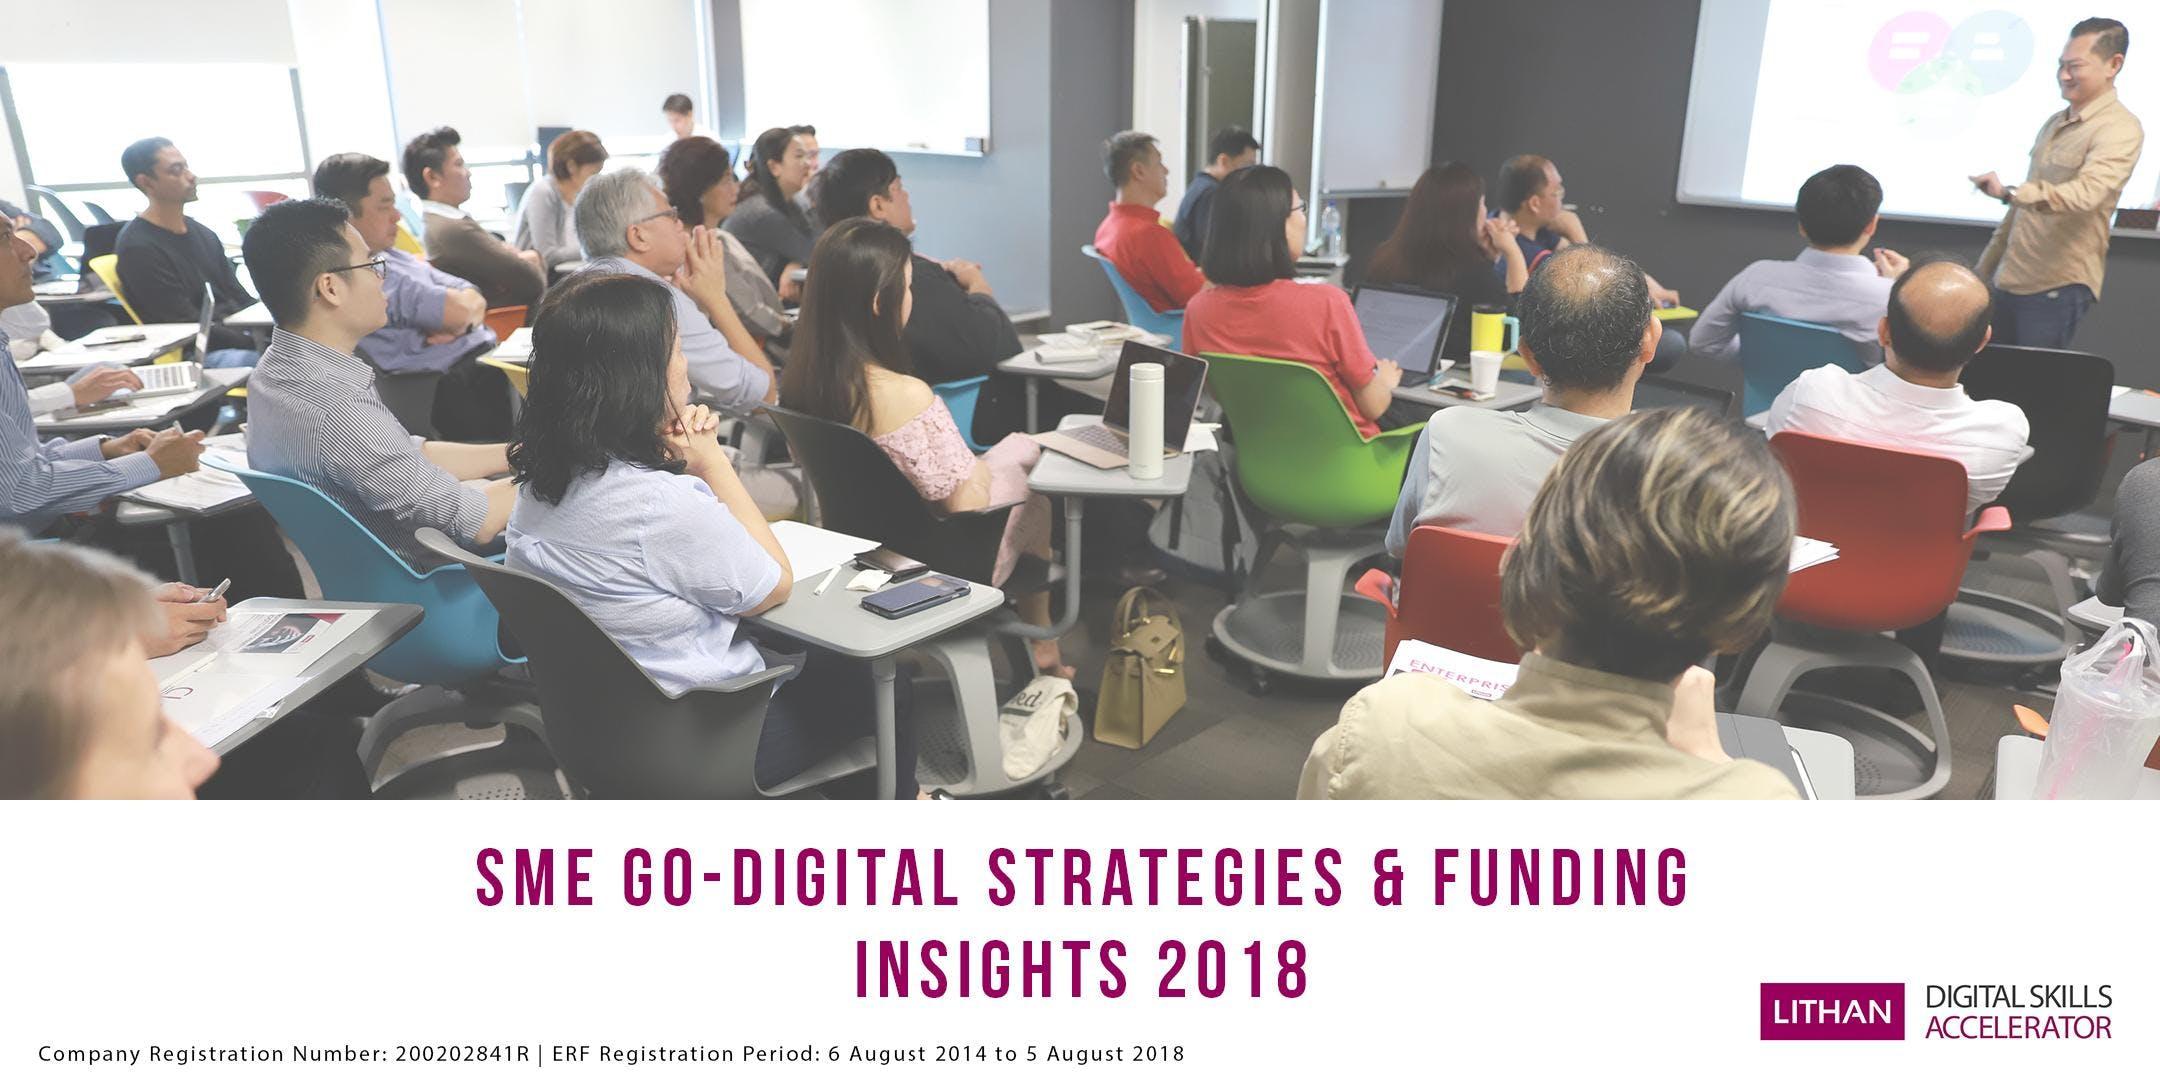 SME Go-Digital Strategies & Funding Insights 2018